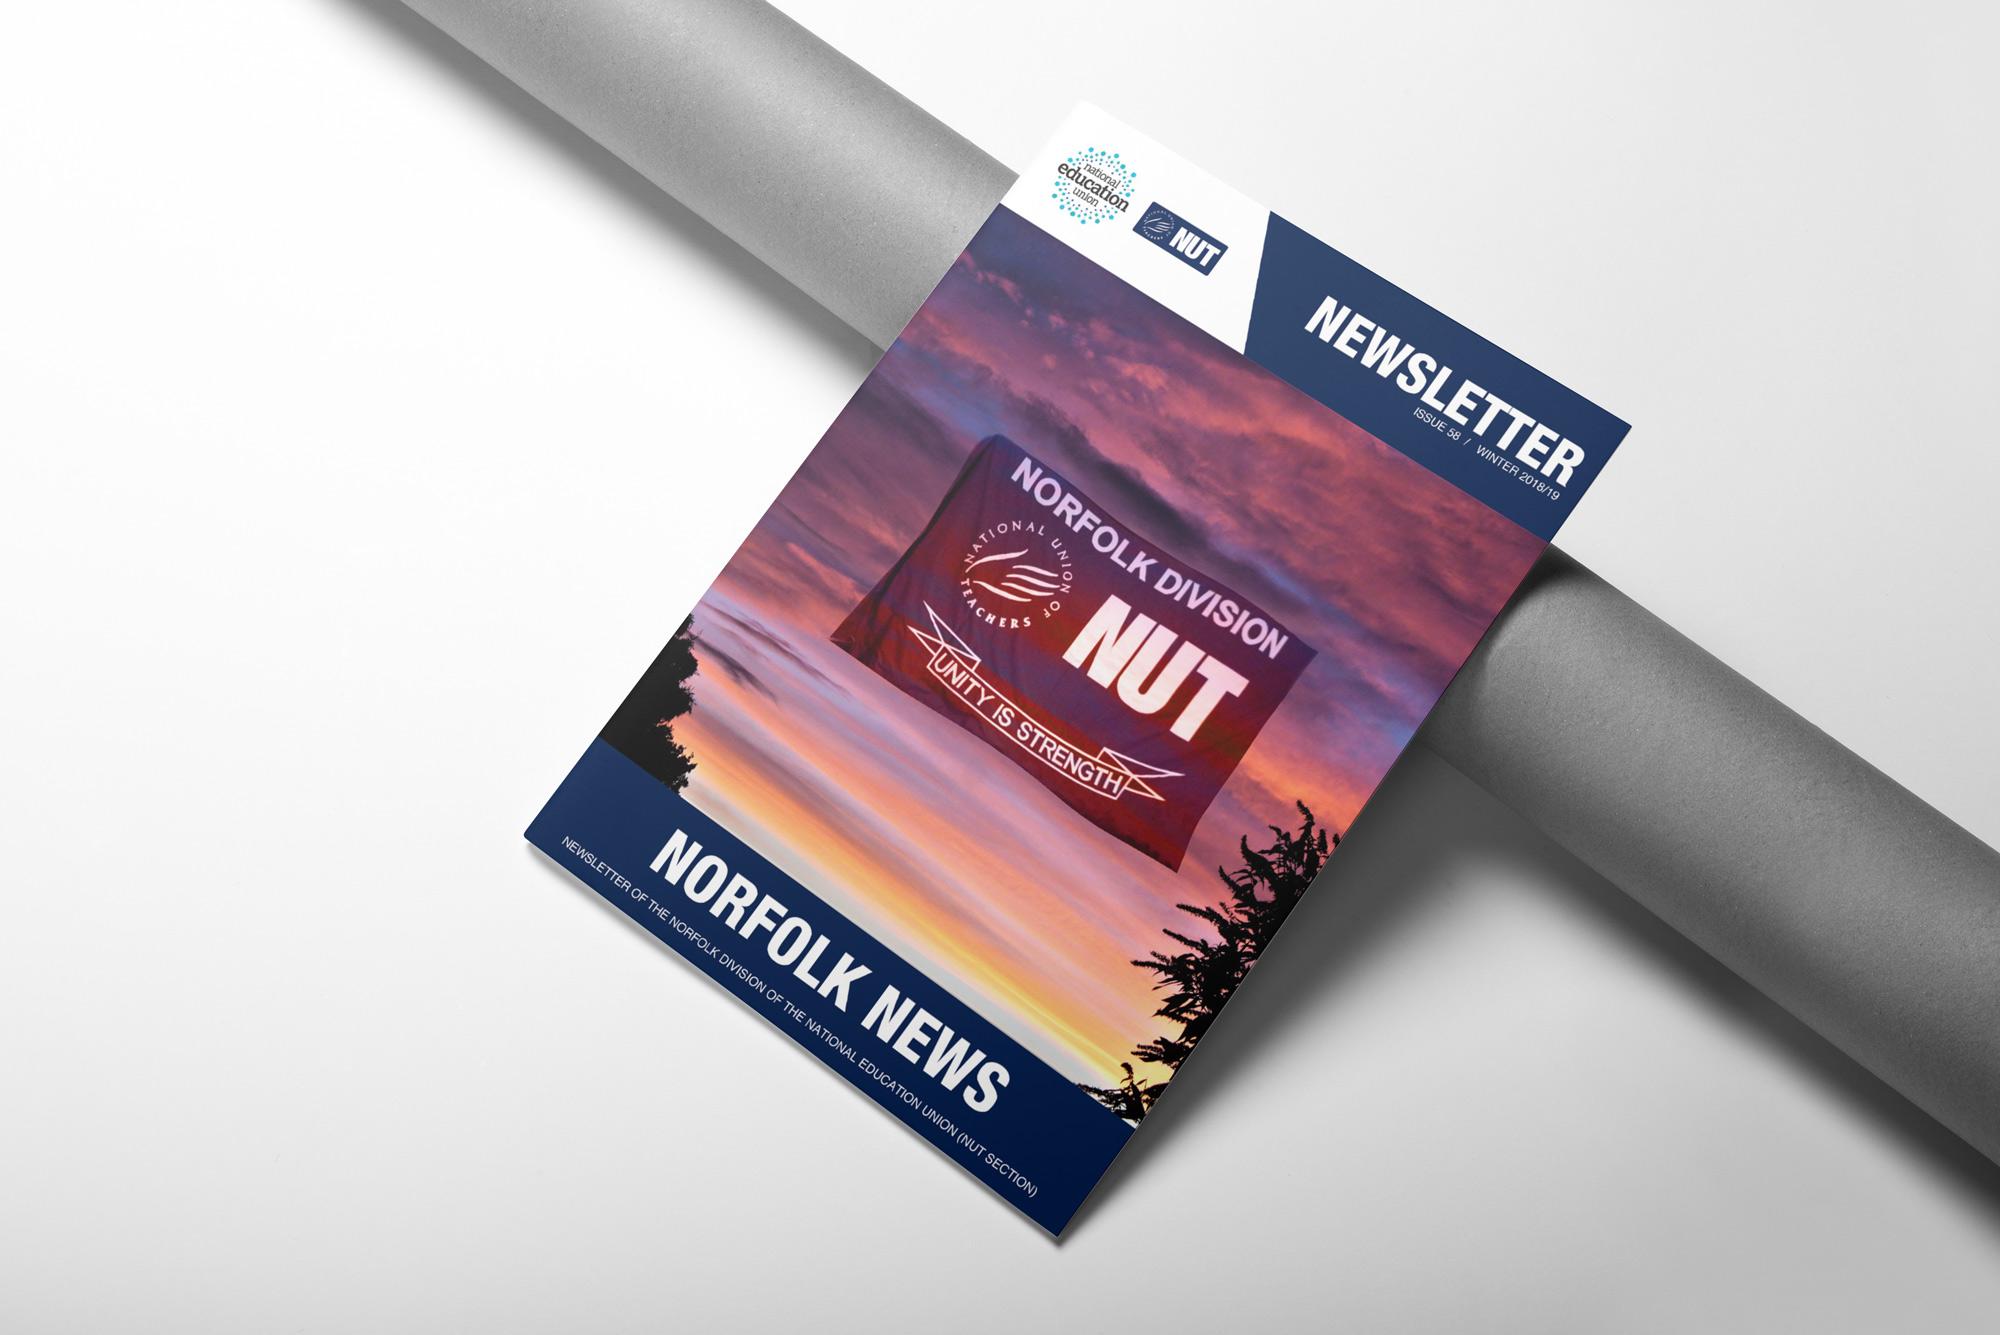 National Education Union Newsletter